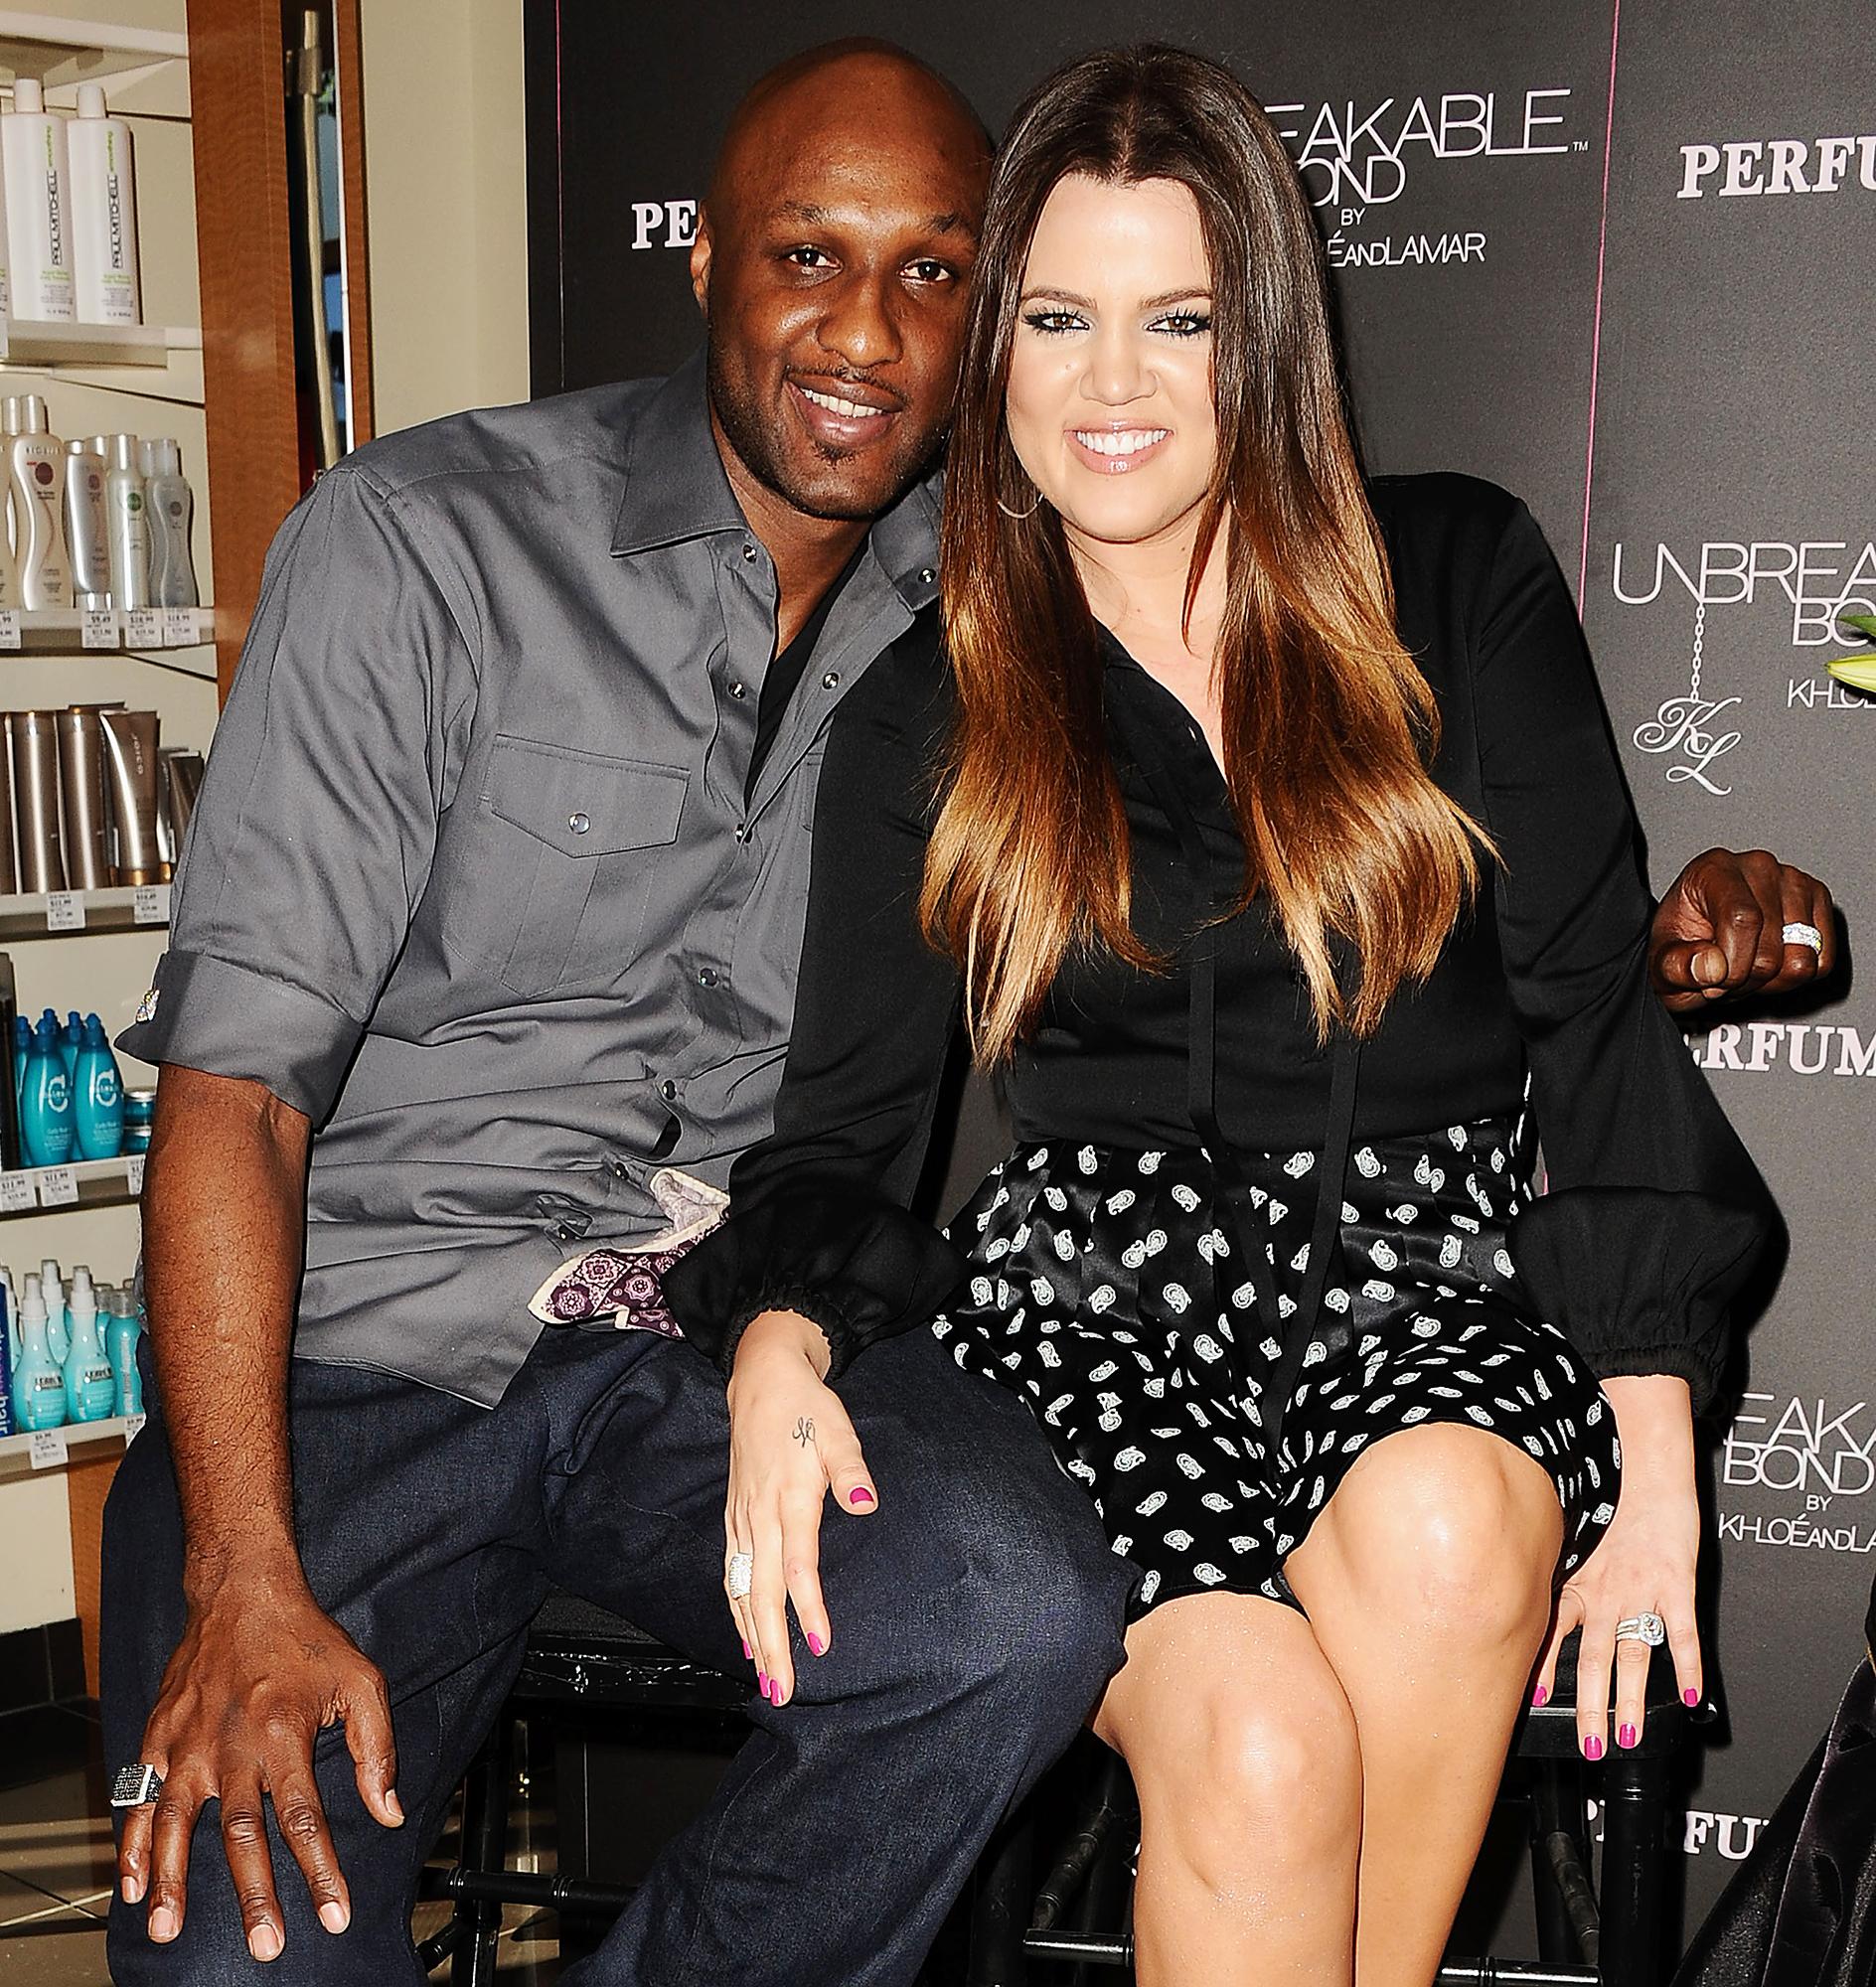 Khloé Kardashian Says Lamar Odom Was the Love of Her Life